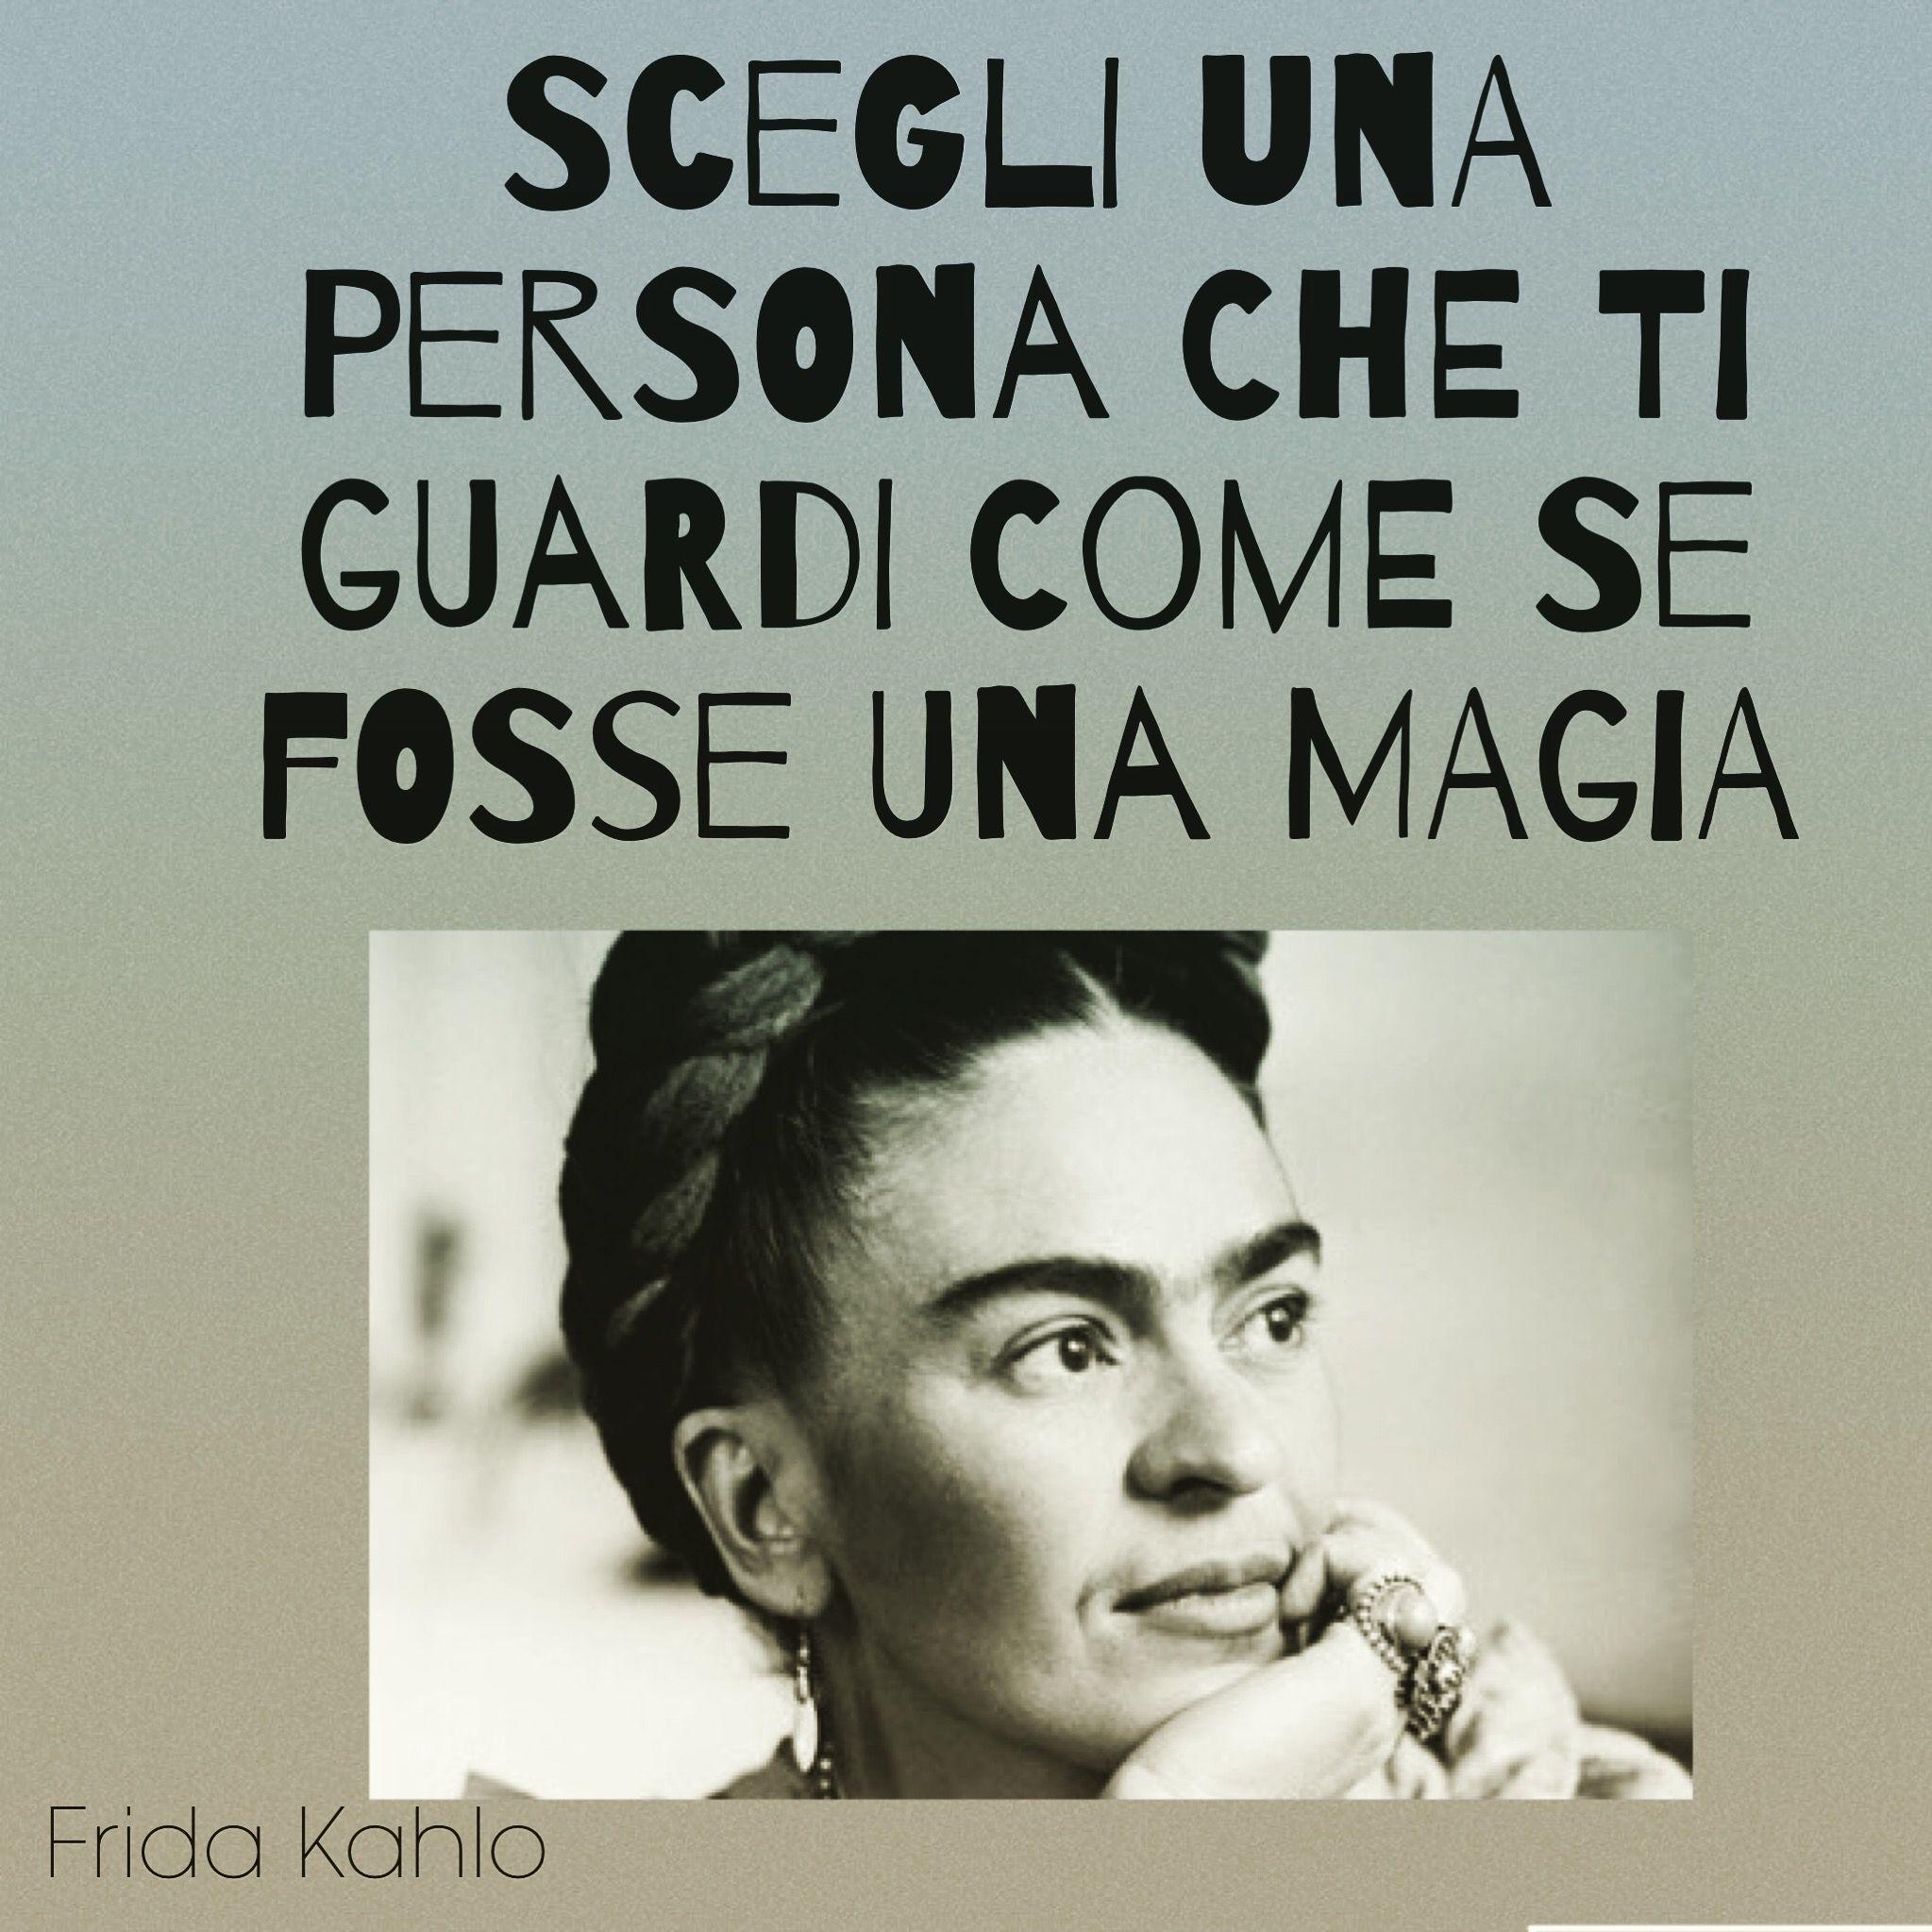 Frida Kahlo Citazioni Citazioni Citazioni Motivazionali